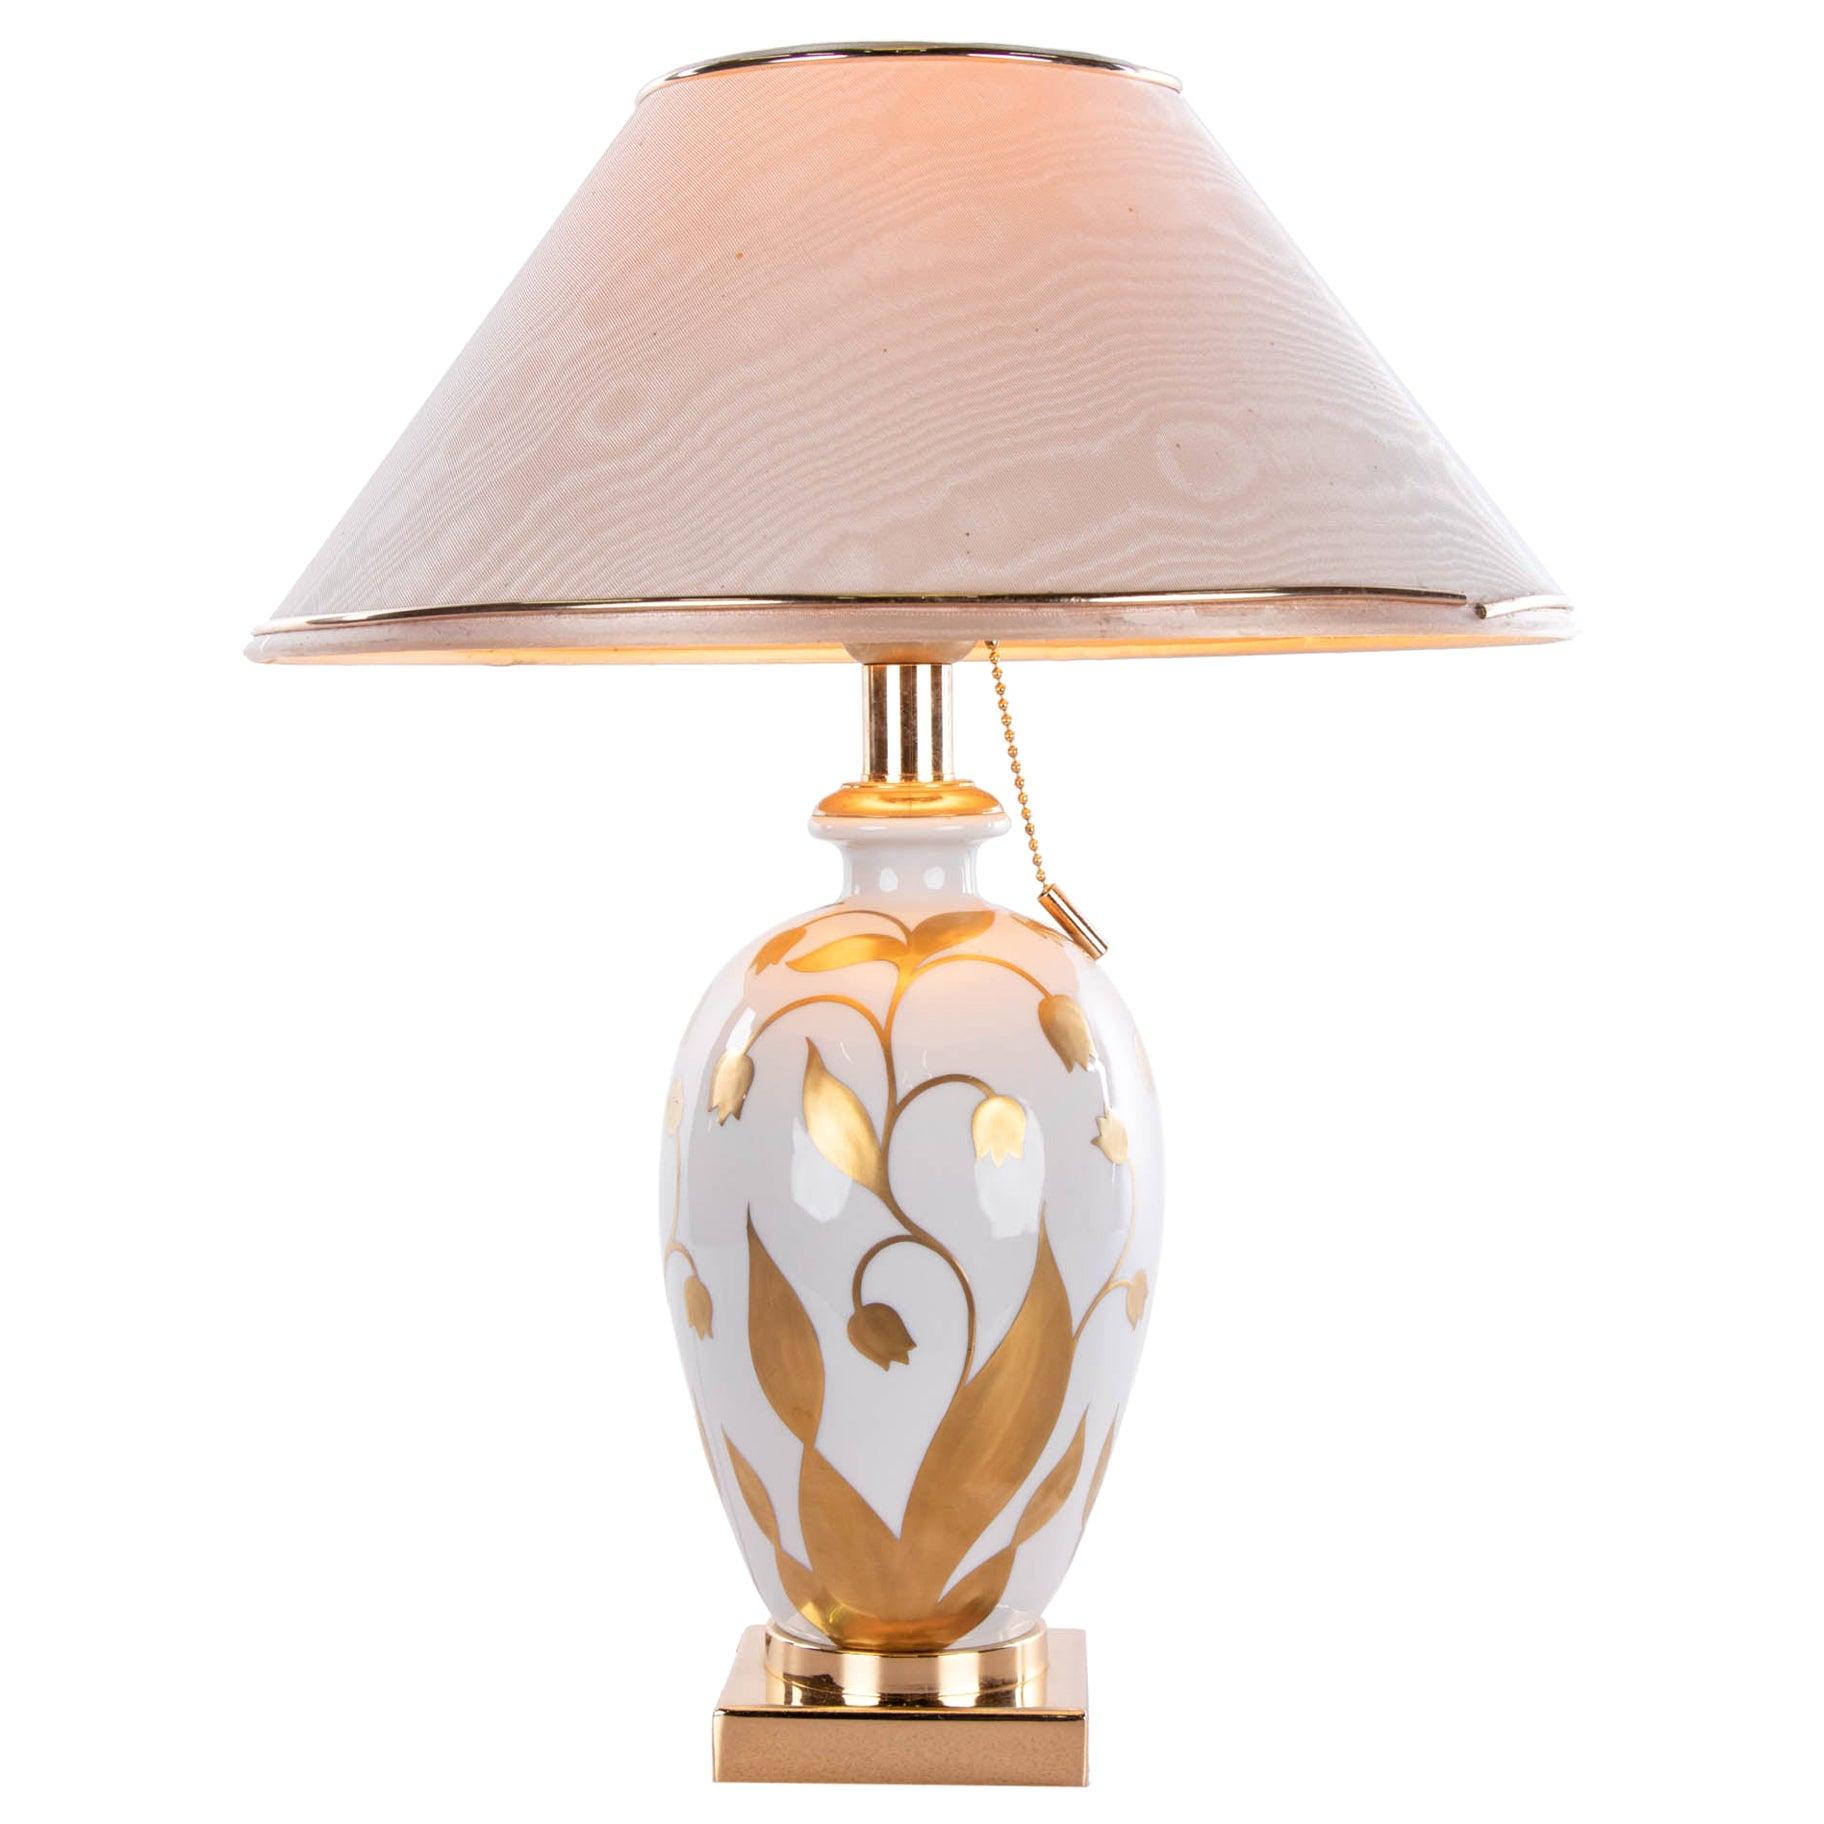 Giulia Mangani Porcelain Table Lamp - Lilium Collection, Italy, Florence